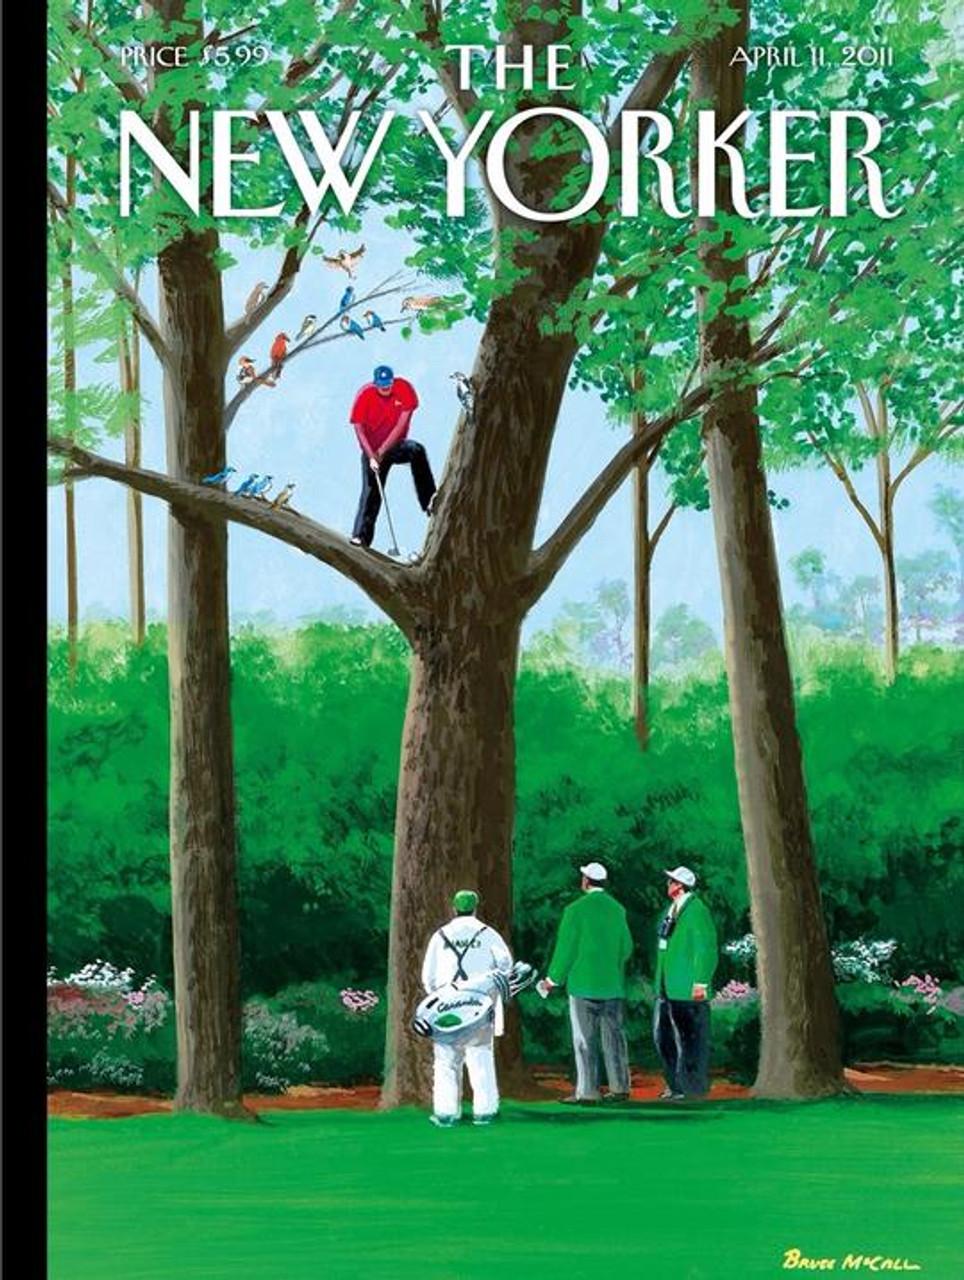 My Best Shot - 500 pieces - New Yorker